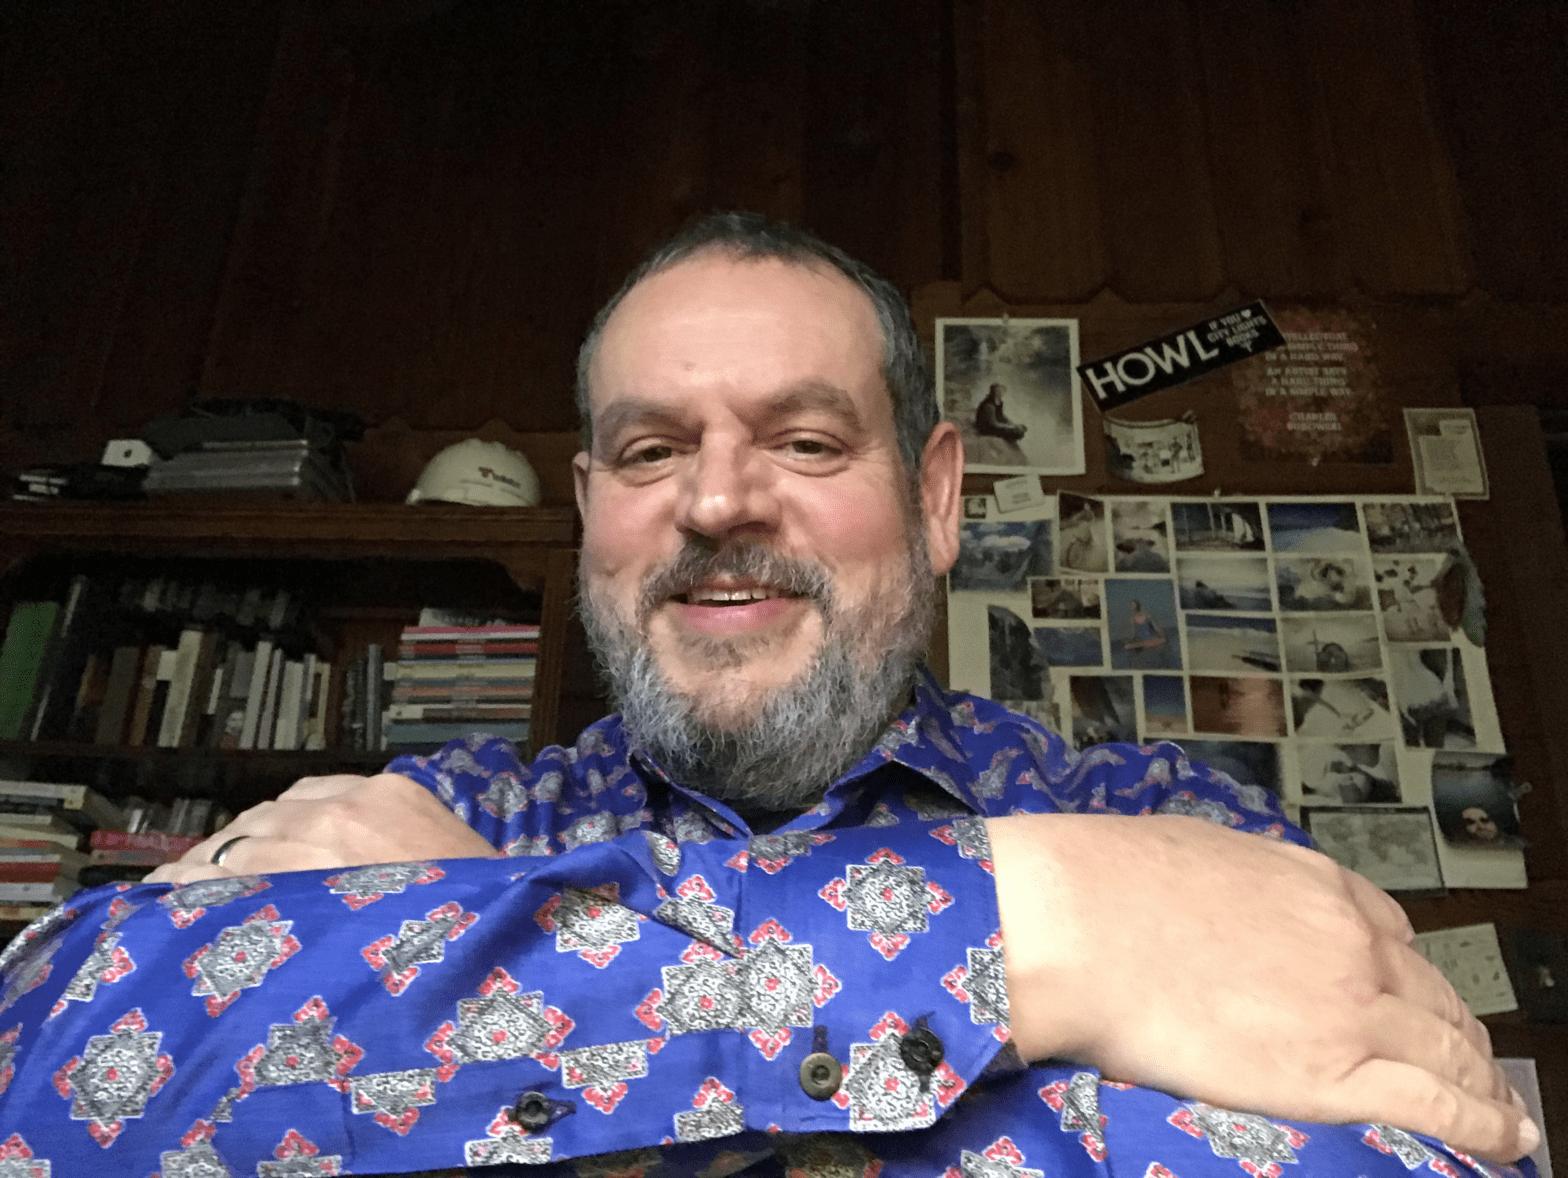 You and George Stenitzer virtual hug